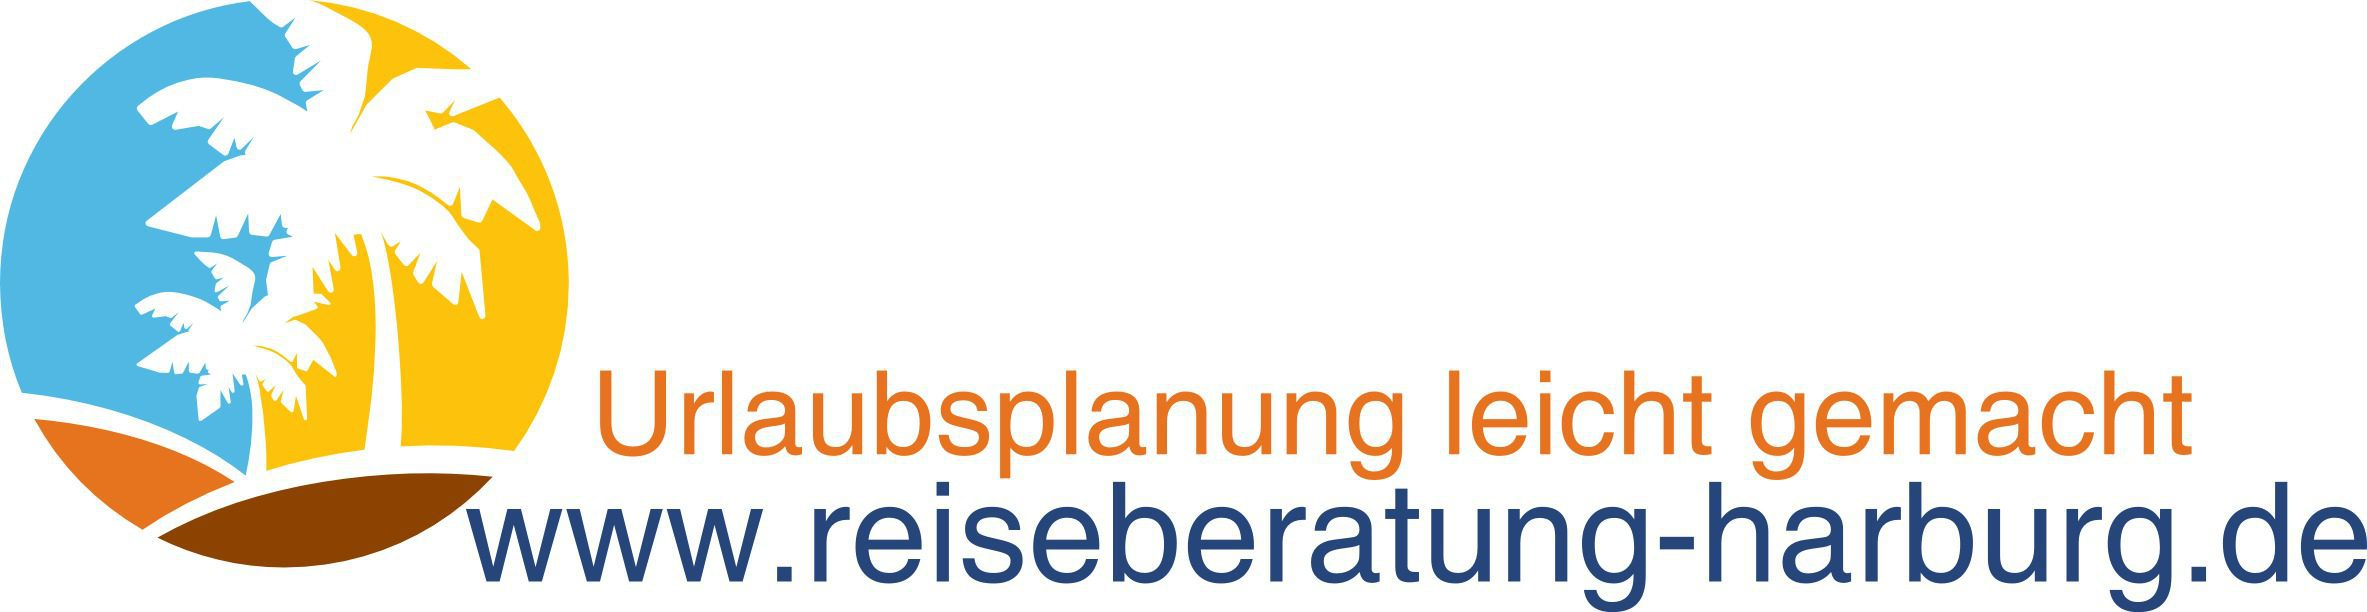 reiseberatung-harburg.de